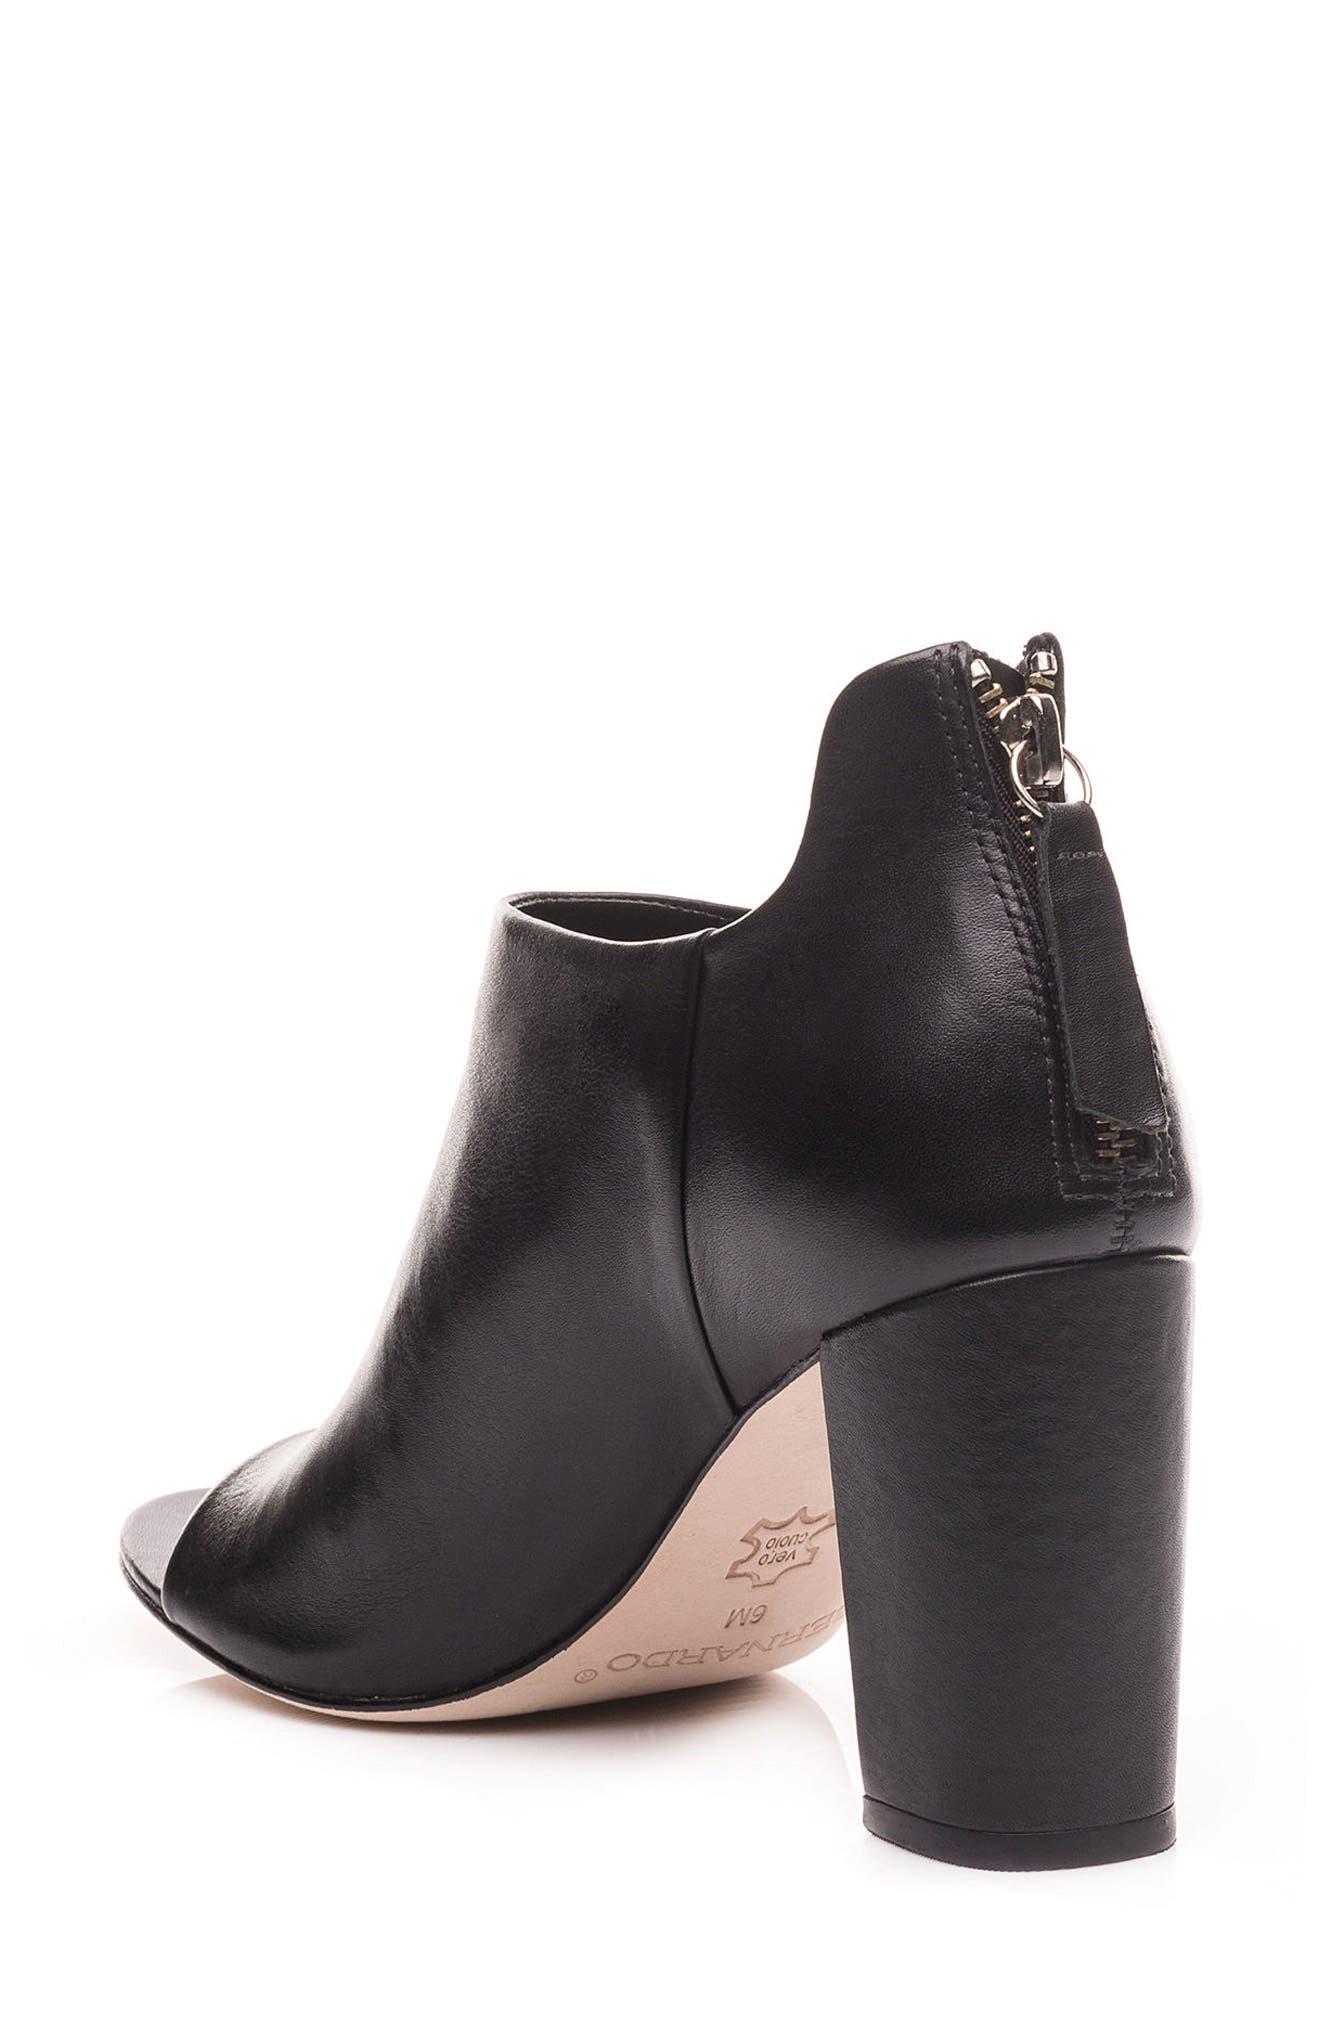 Heather Peep Toe Bootie,                             Alternate thumbnail 2, color,                             Black Leather